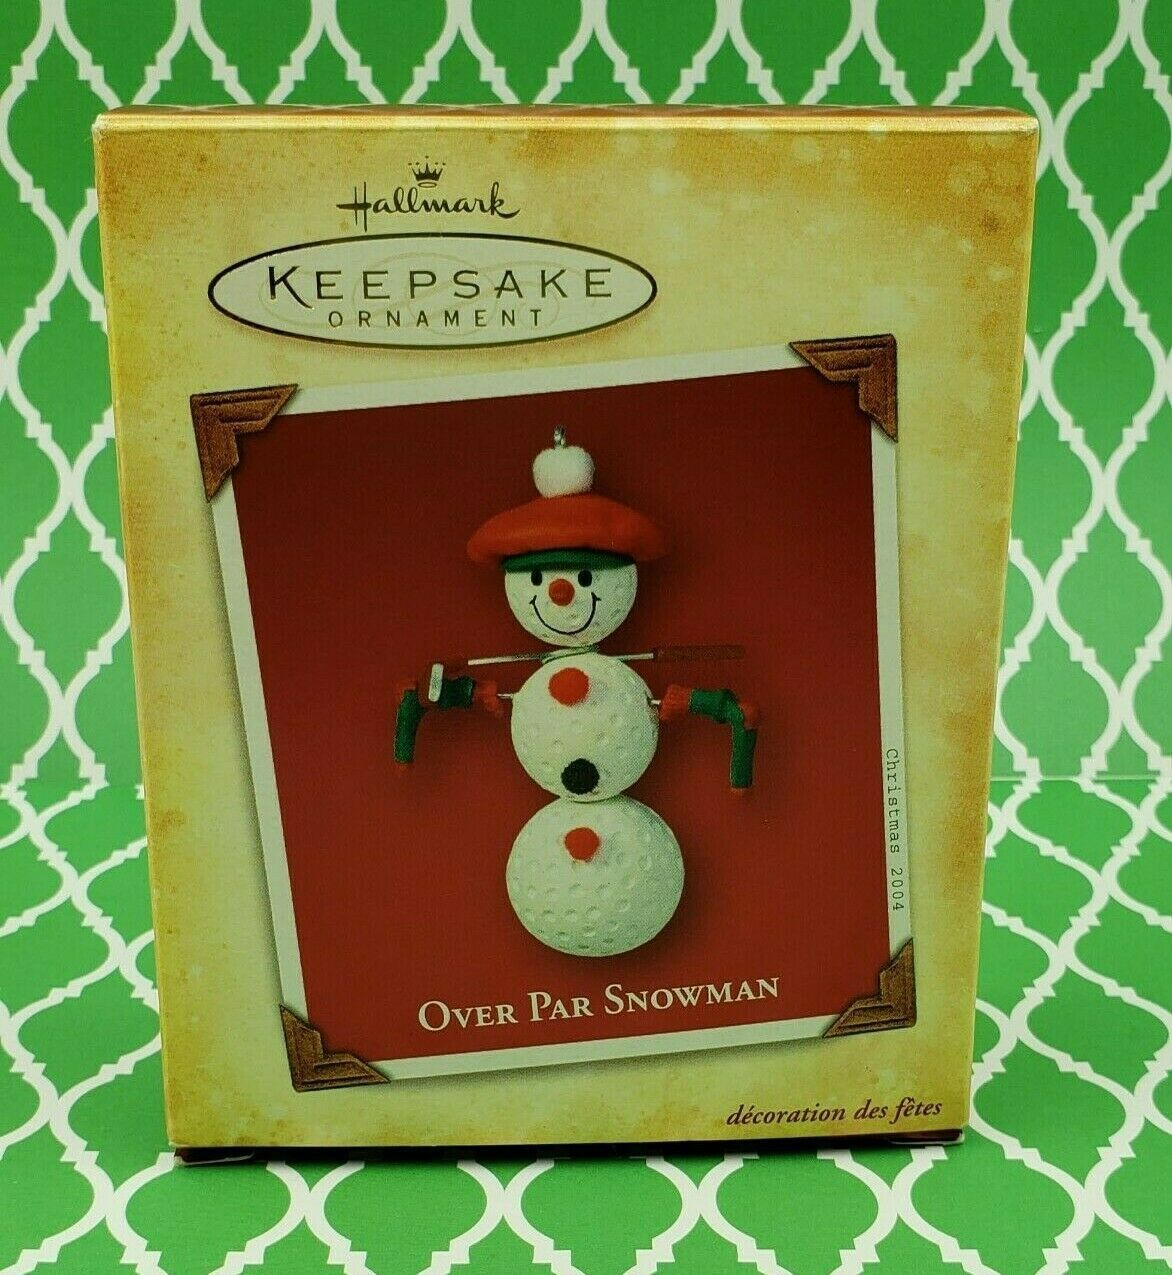 Hallmark Over Par Snowman 2004 Keepsake Ornament in